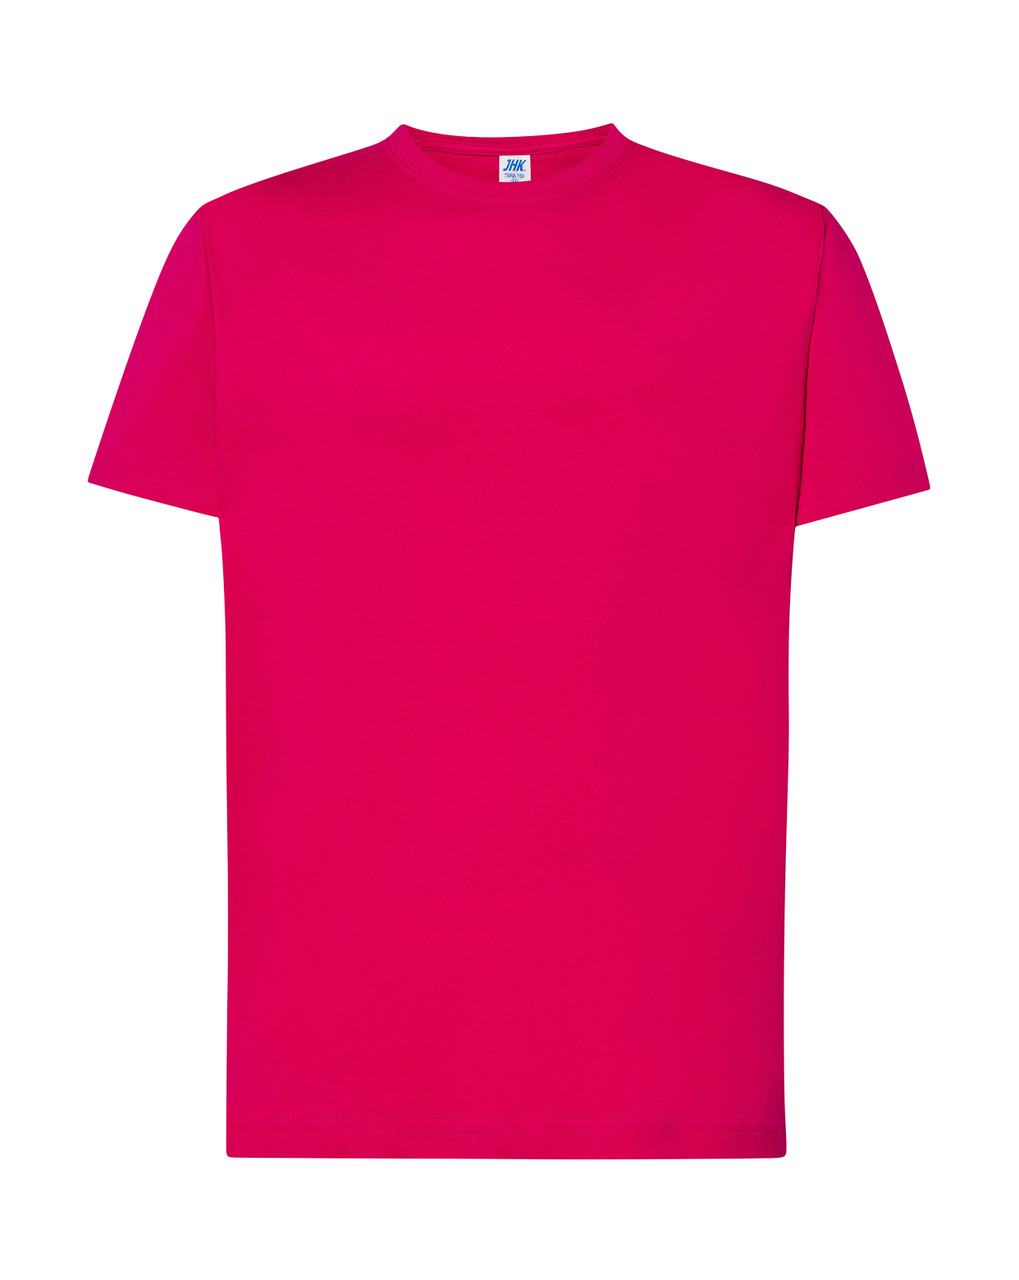 Мужская футболка JHK REGULAR T-SHIRT цвет малиновый (RP)